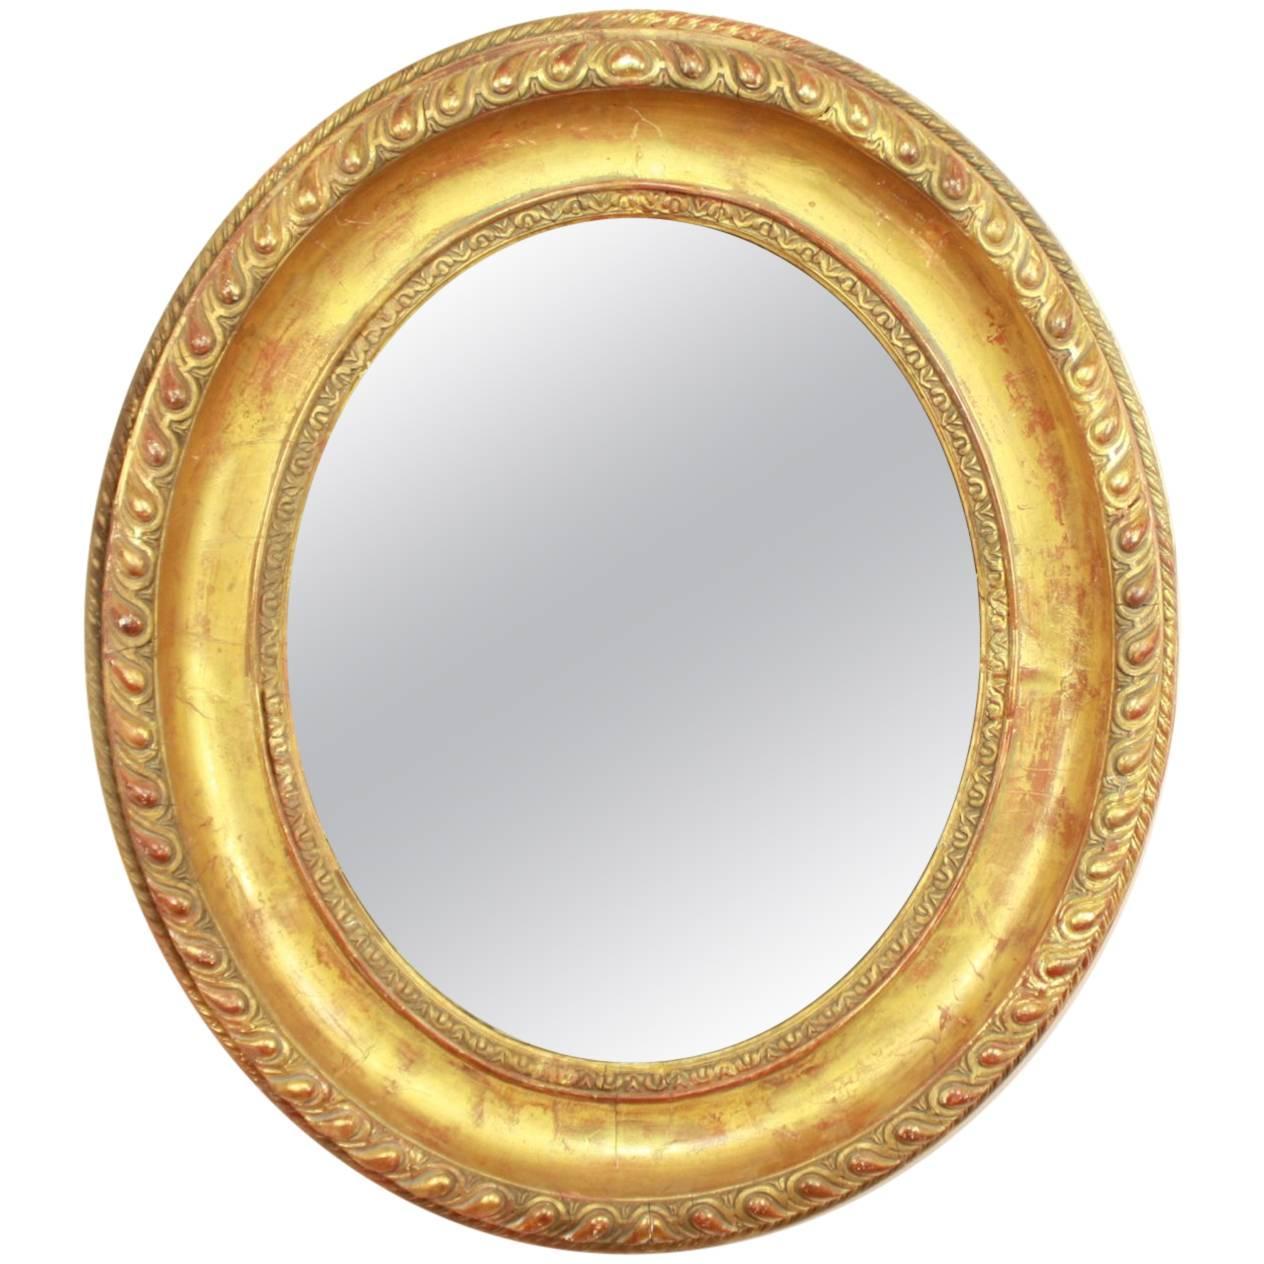 Louis XVI Oval Giltwood Wall Mirror